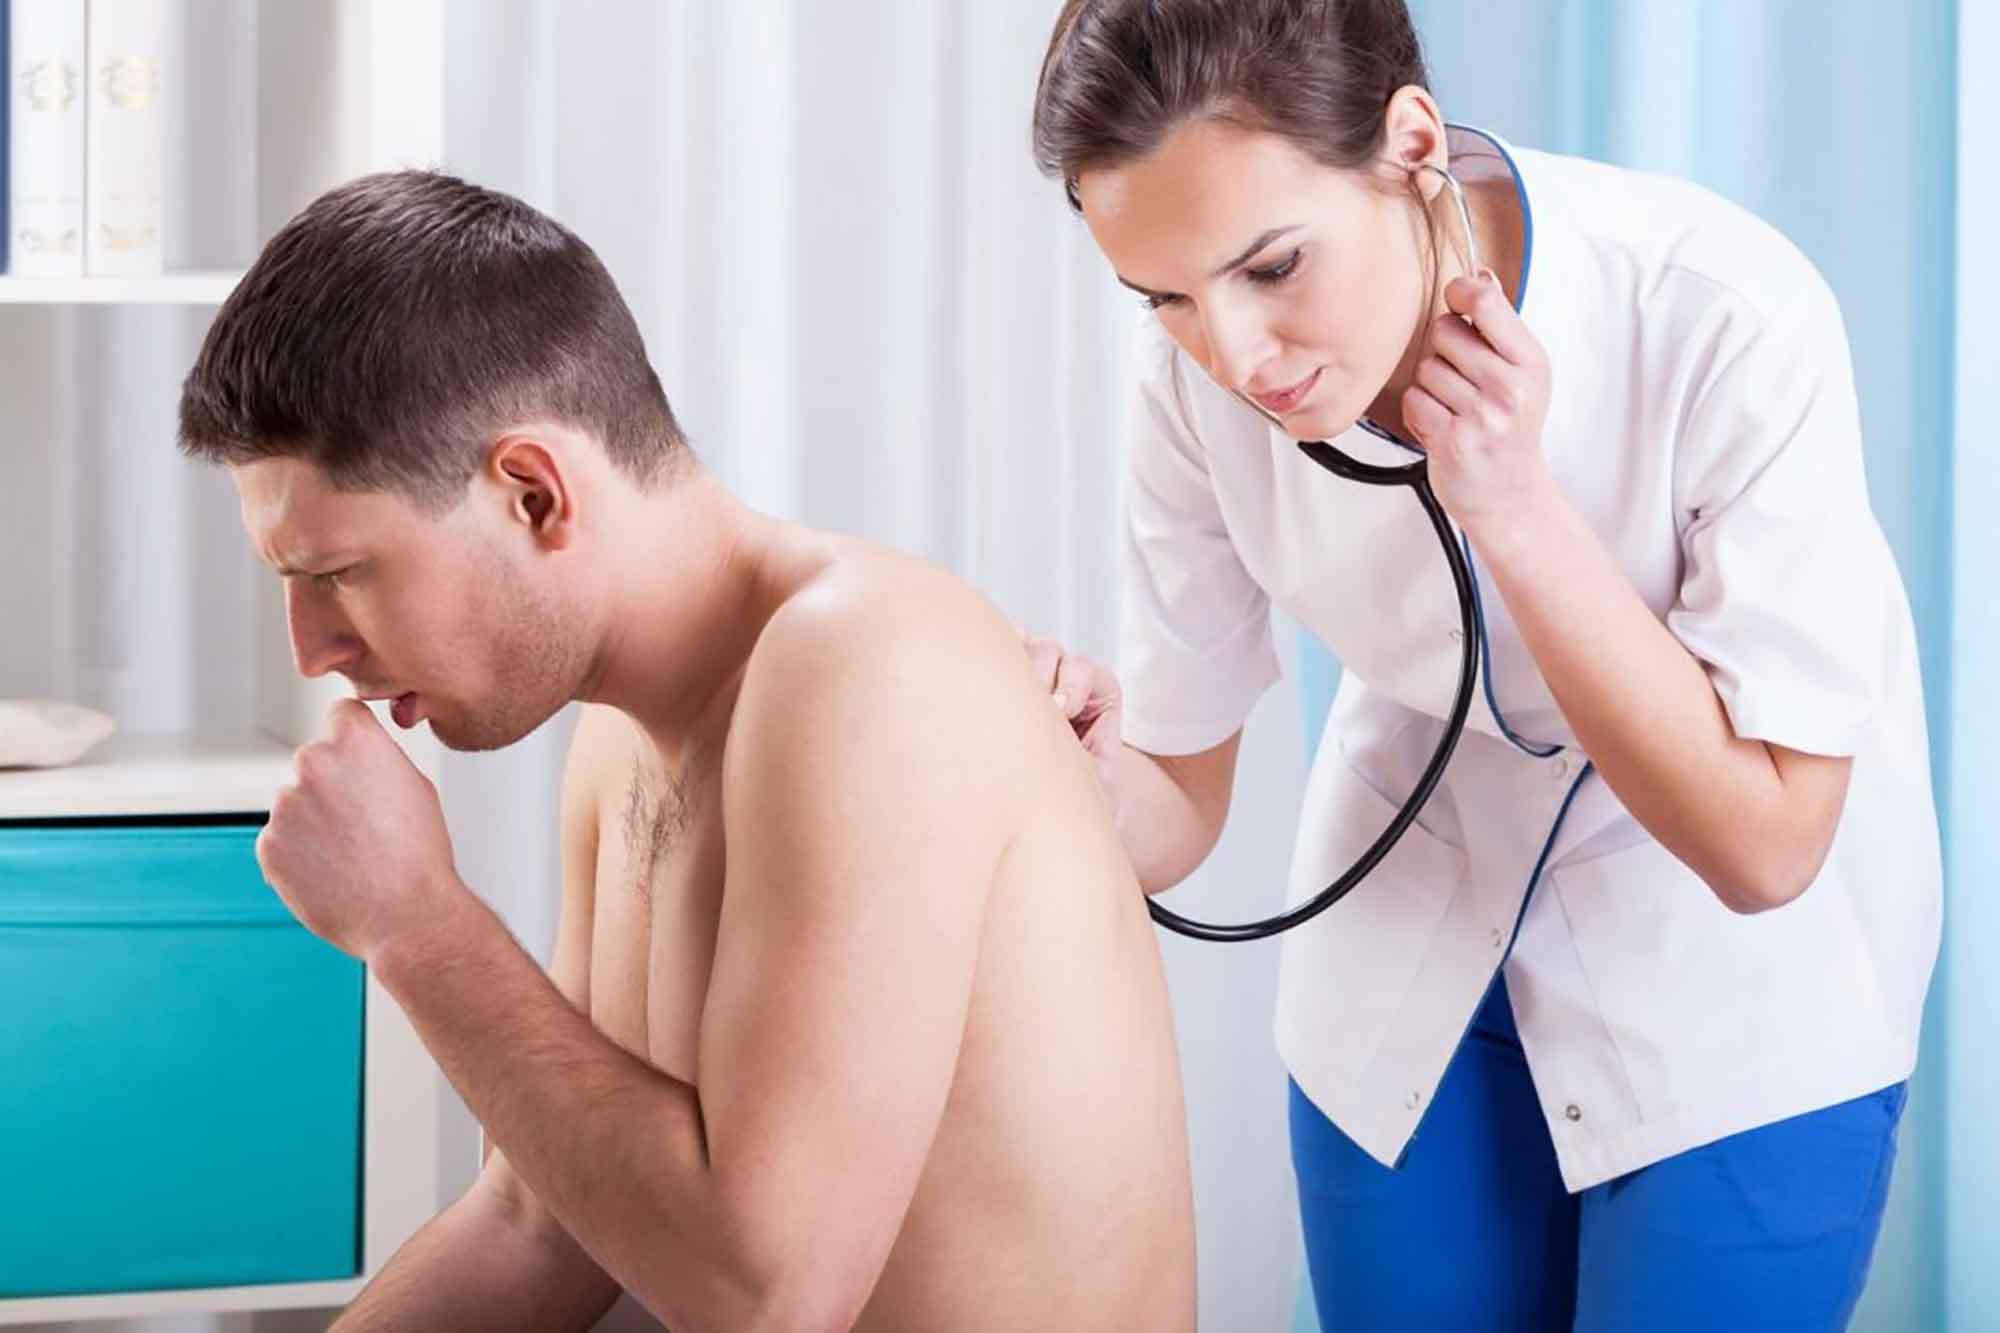 Правосторонняя пневмония - особенности